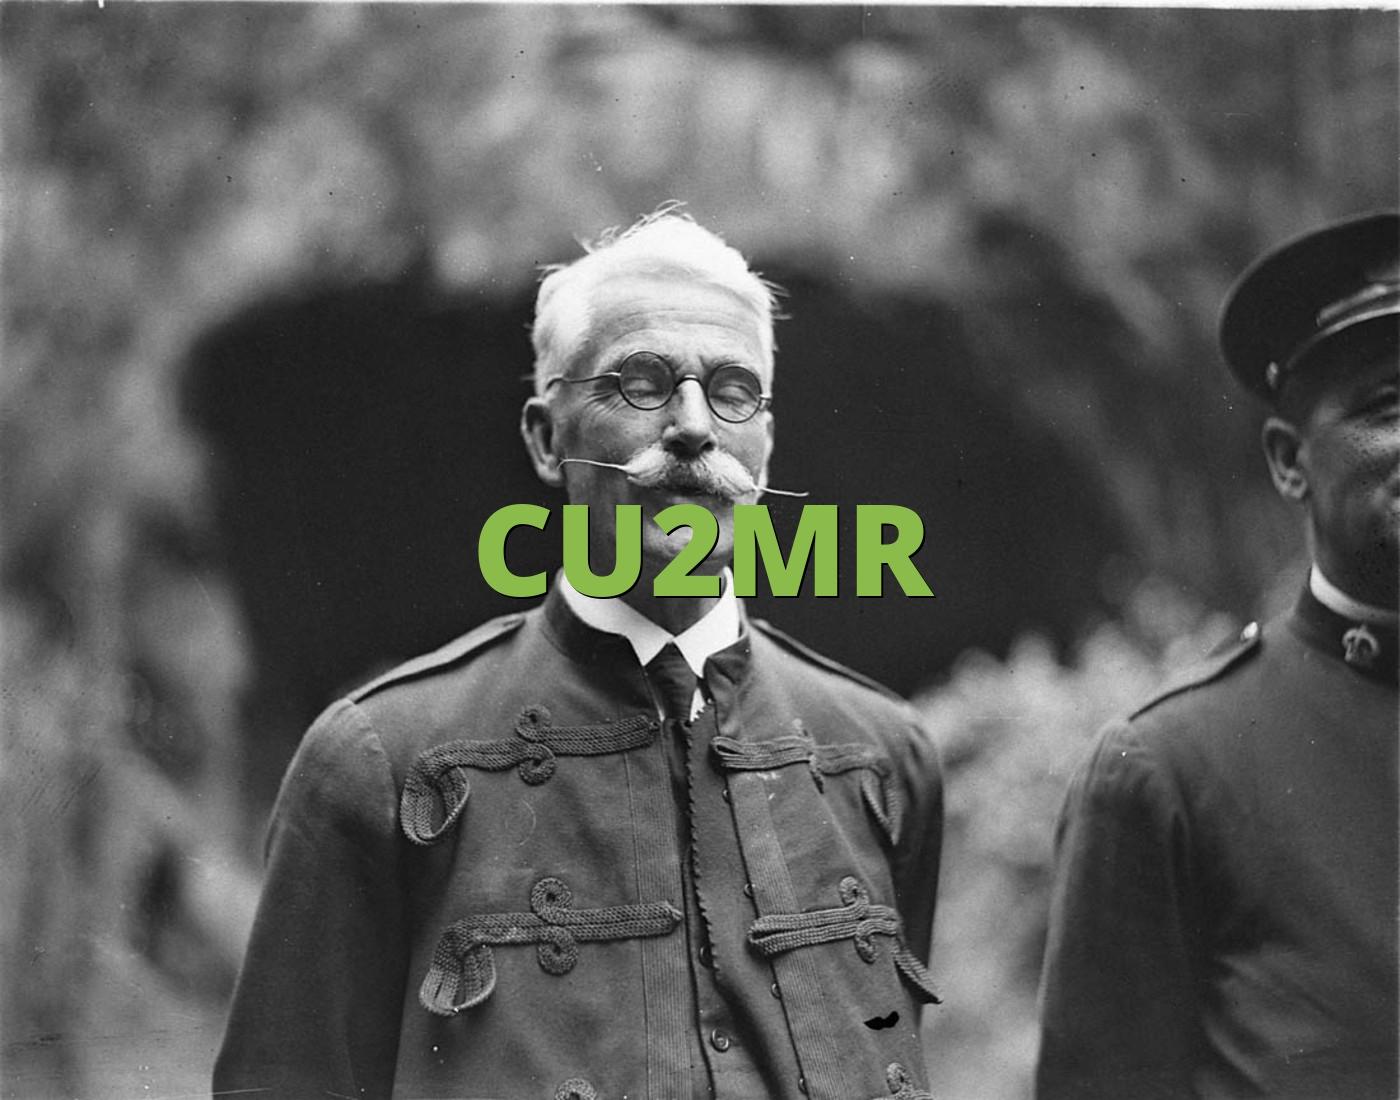 CU2MR